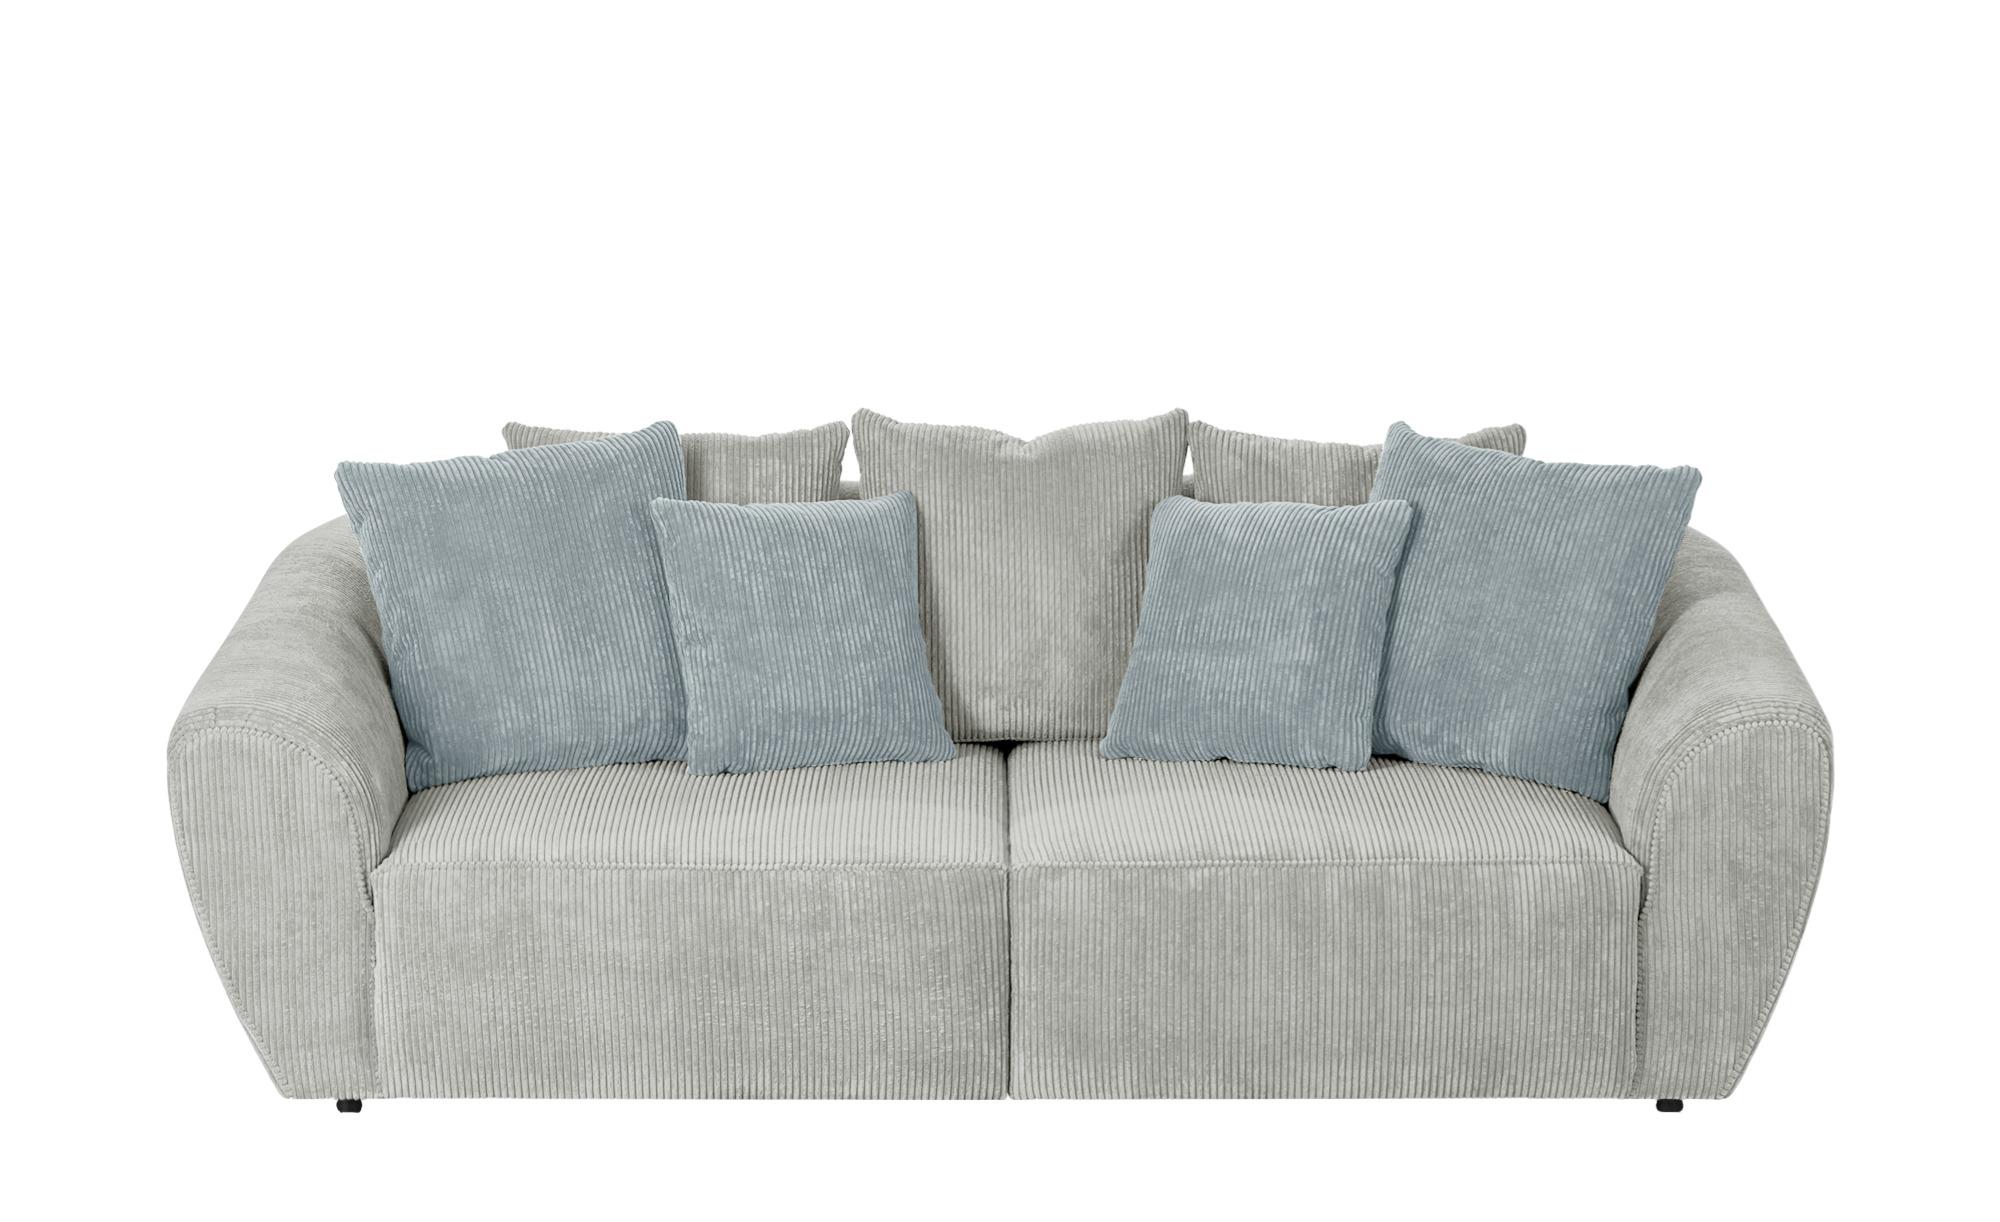 smart Big Sofa  Savita ¦ Maße (cm): B: 255 H: 90 T: 113 Polstermöbel > Sofas > 3-Sitzer - Höffner